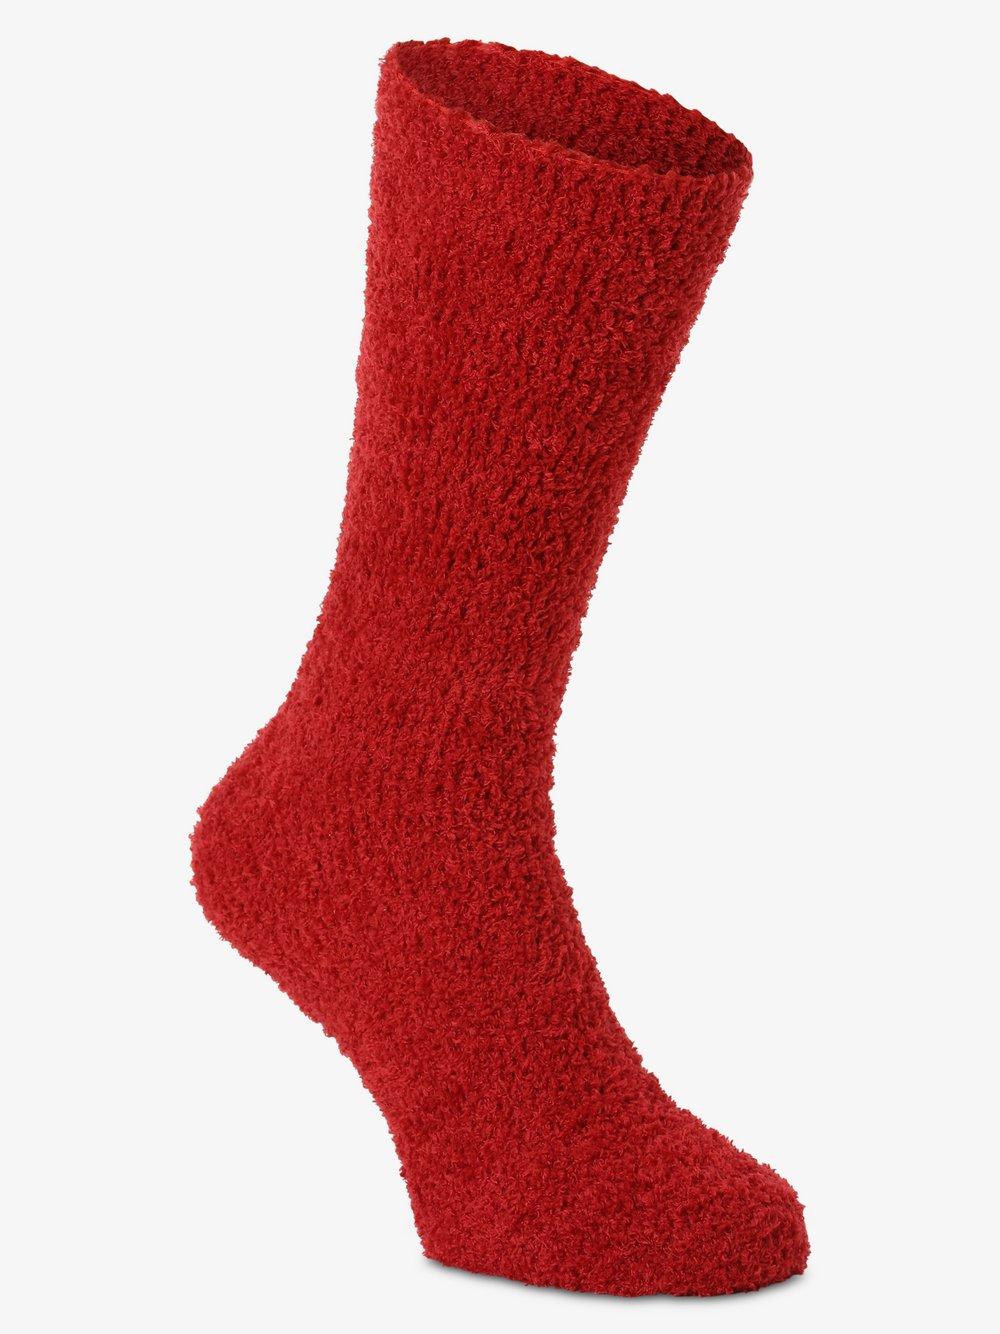 Cuddly Socks – Skarpety damskie, czerwony Van Graaf 456720-0003-00000